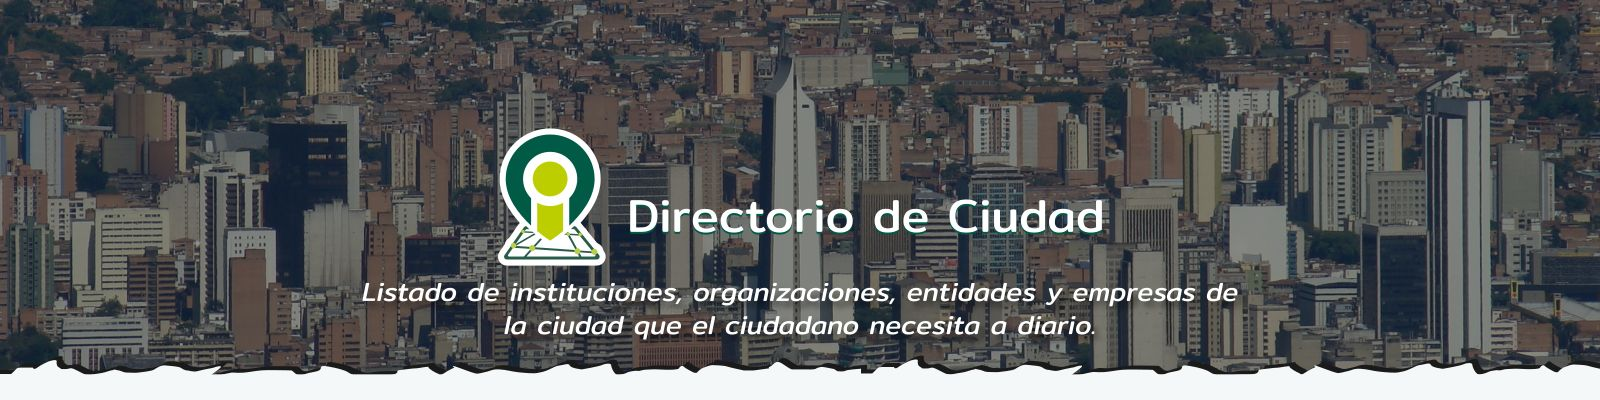 directorios.jpg